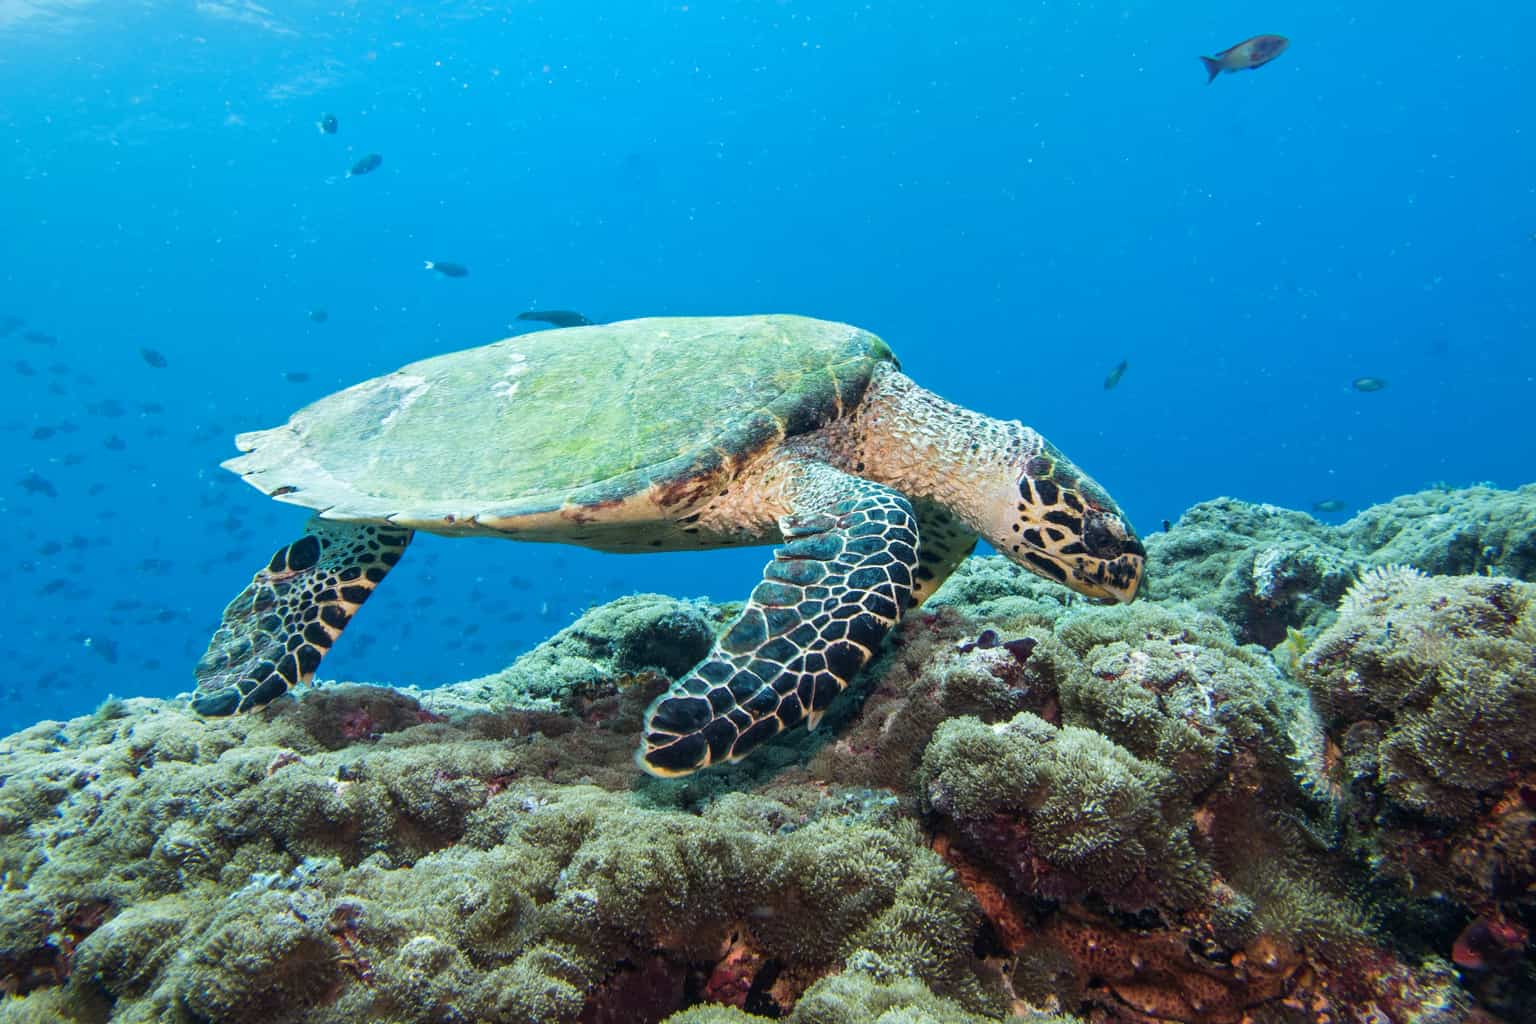 Maldives Liveaboard Holidays Emperor Serenity Hawksbill Turtle